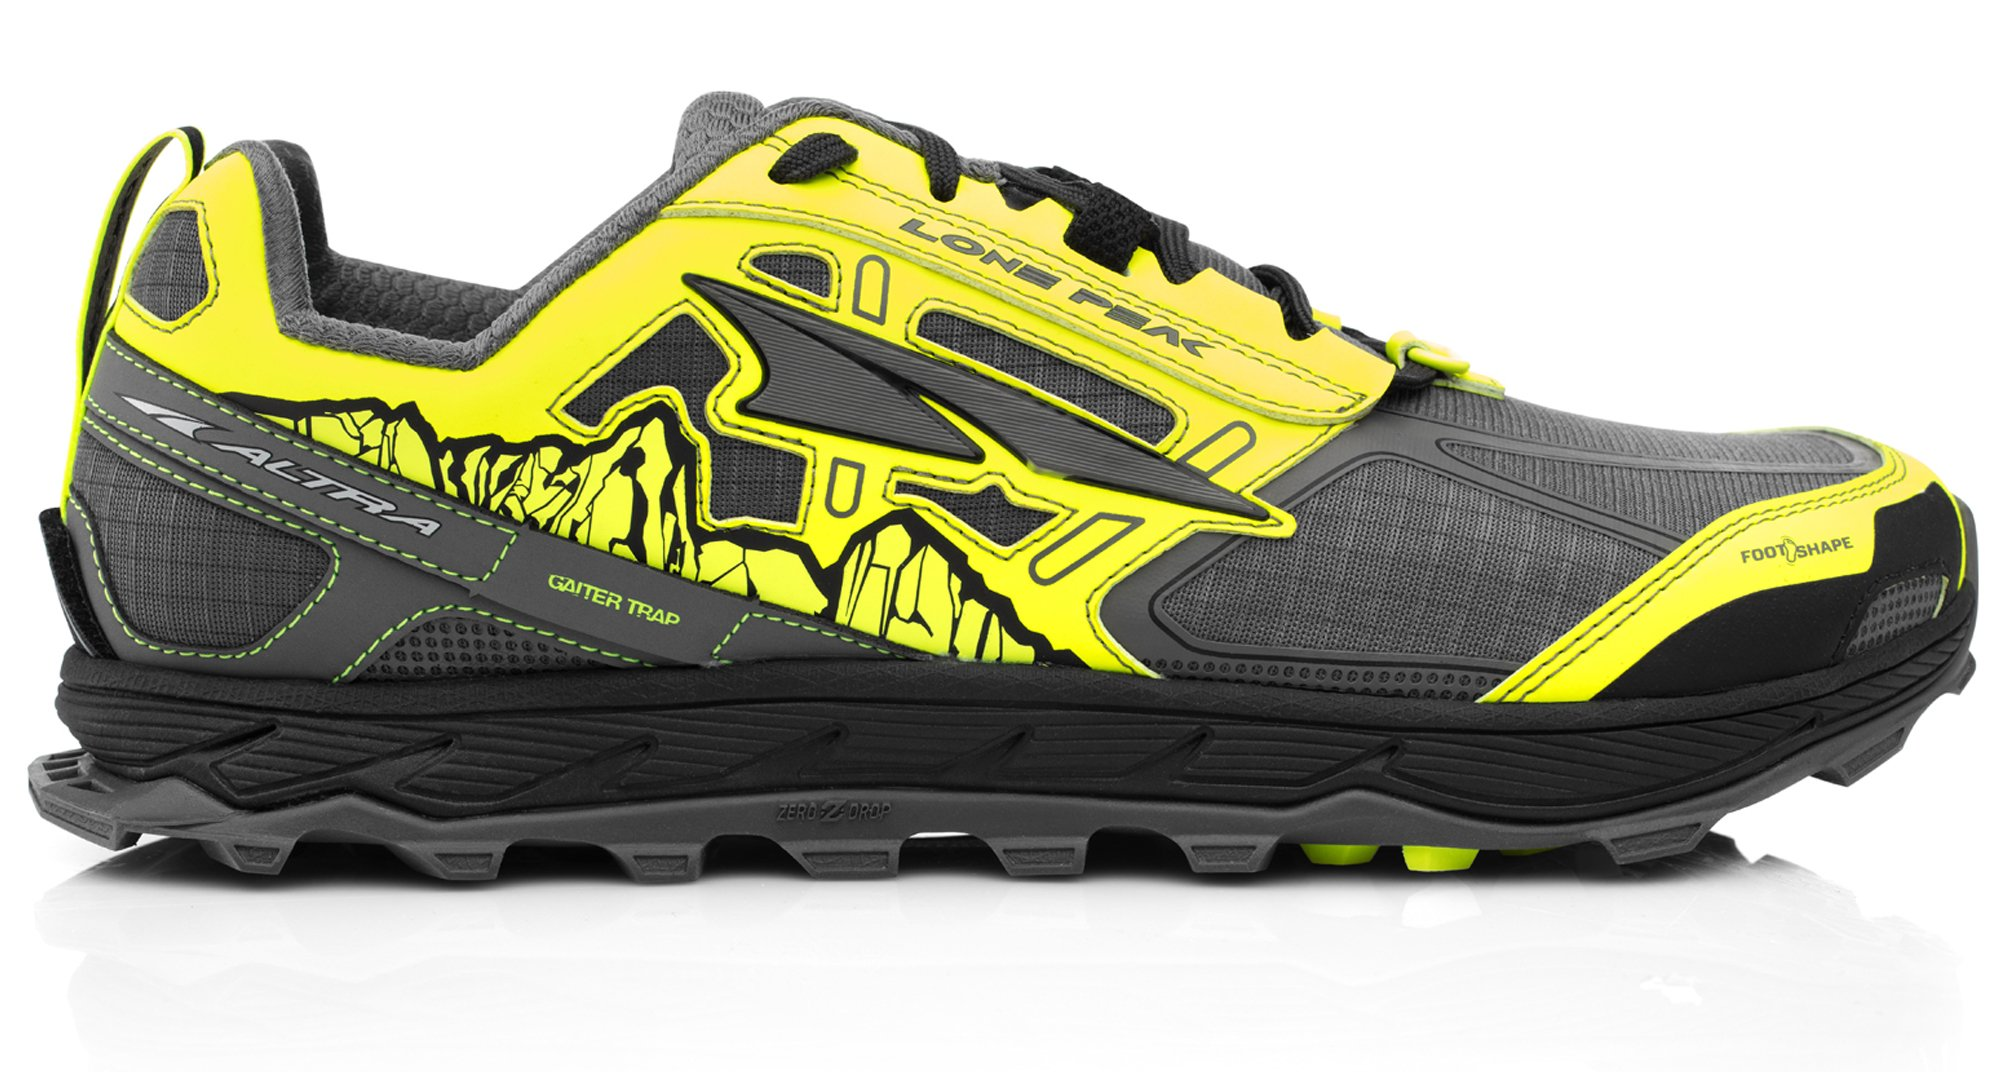 Altra AFM1855F Men's Lone Peak 4.0 Trail Running Shoe, Gray/Yellow - 7 D(M) US